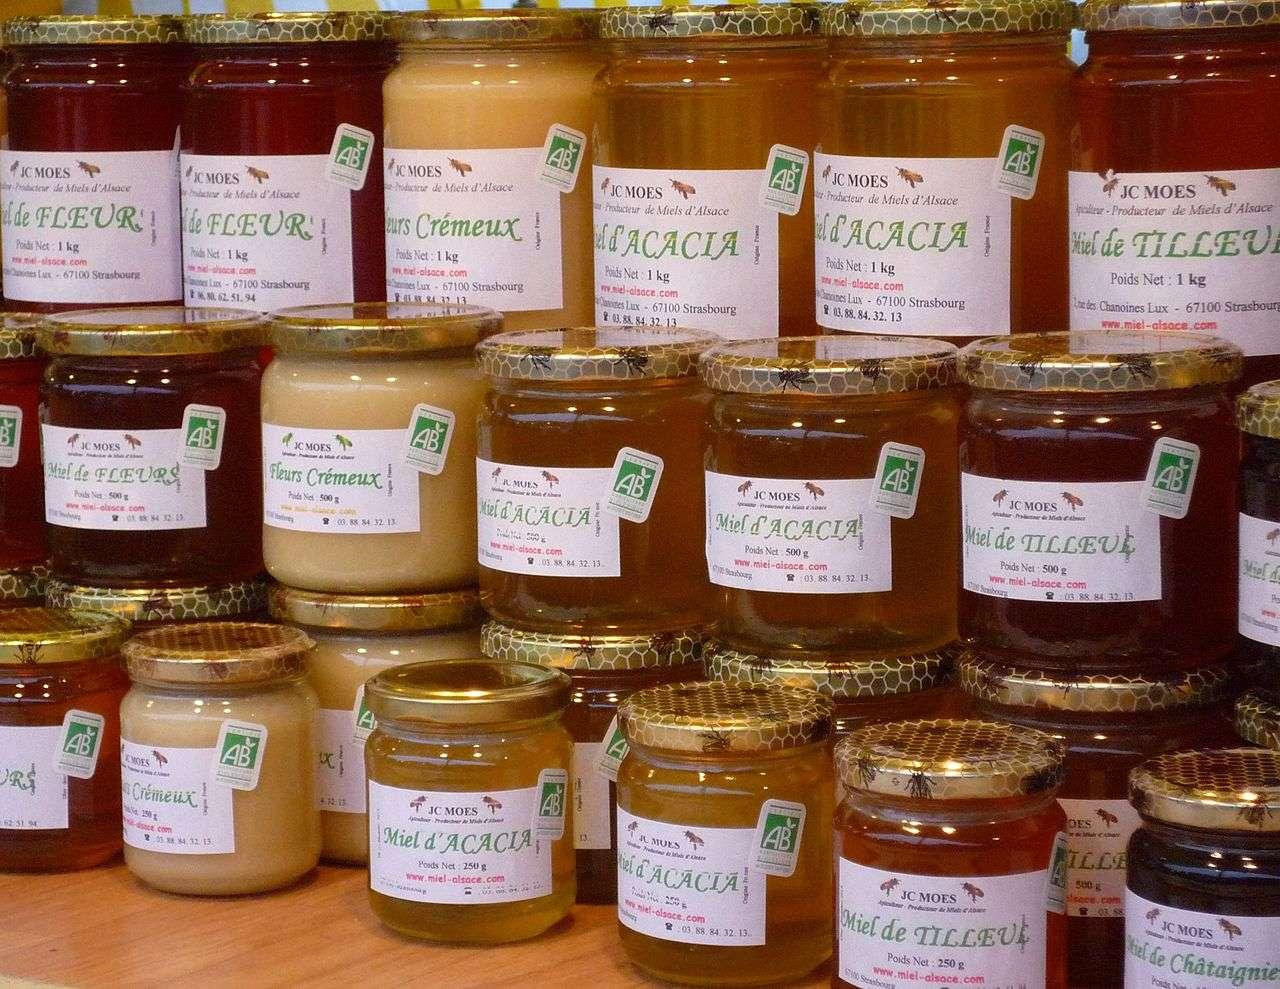 Miels d'Alsace issus de l'agriculture biologique. © Claude Truong-Ngoc, Wikimedia, cc by sa 3.0